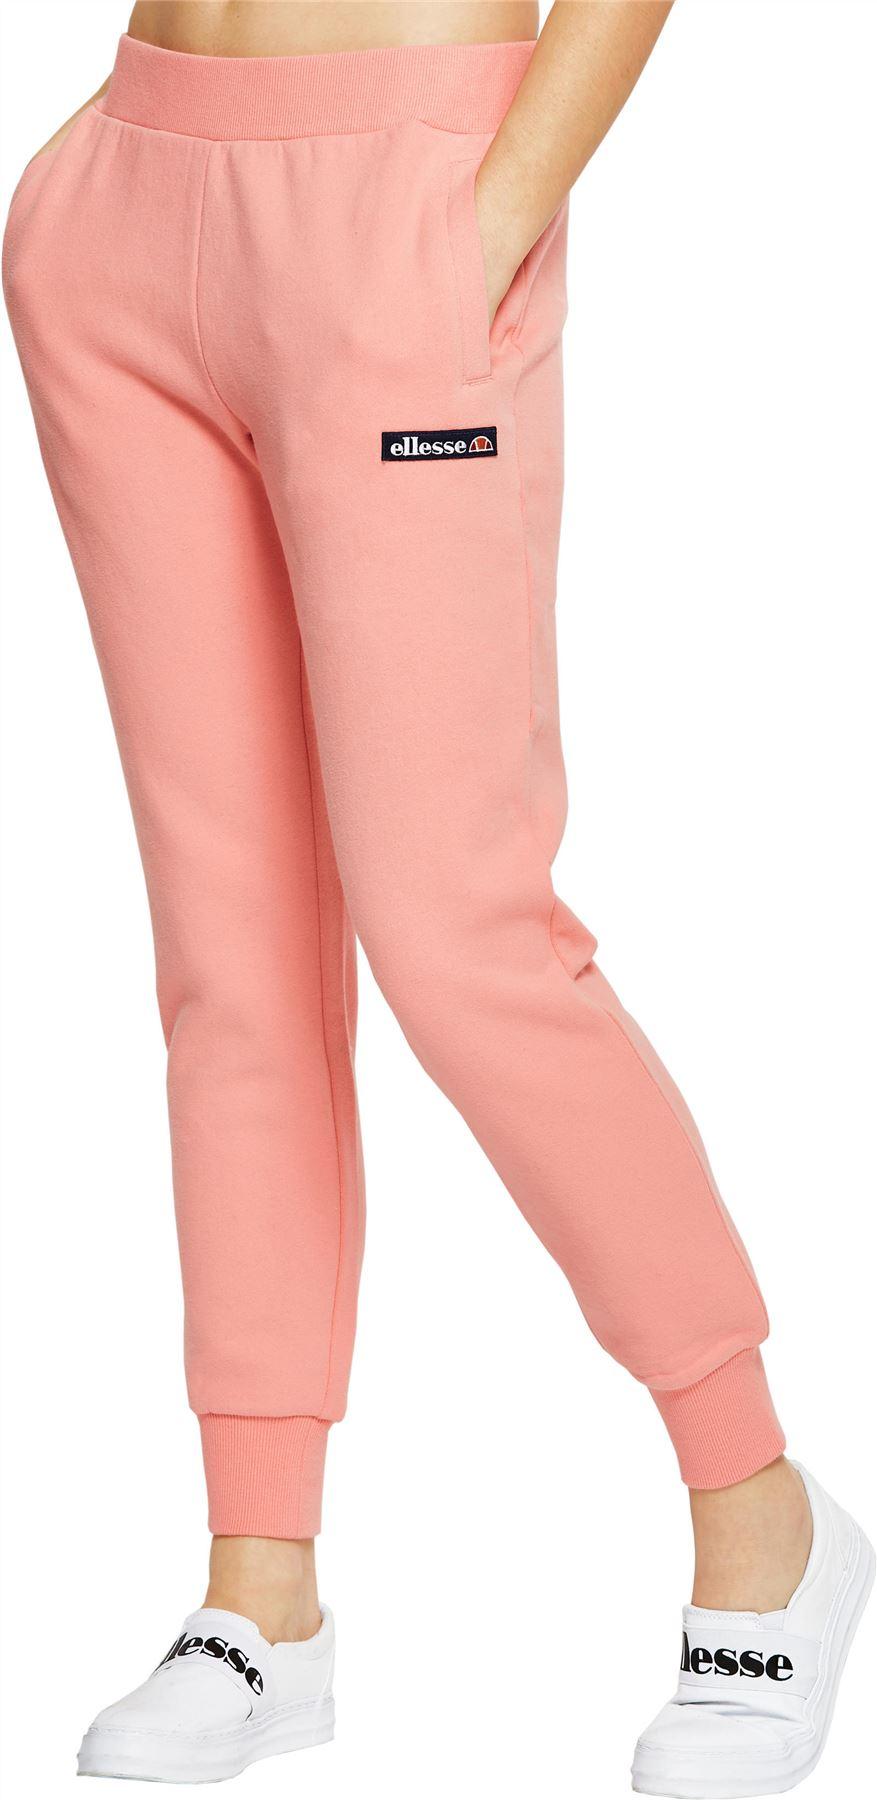 Ellesse-Jogger-Bottoms-Women-039-s-Sweat-Pants-Assorted-Styles thumbnail 15